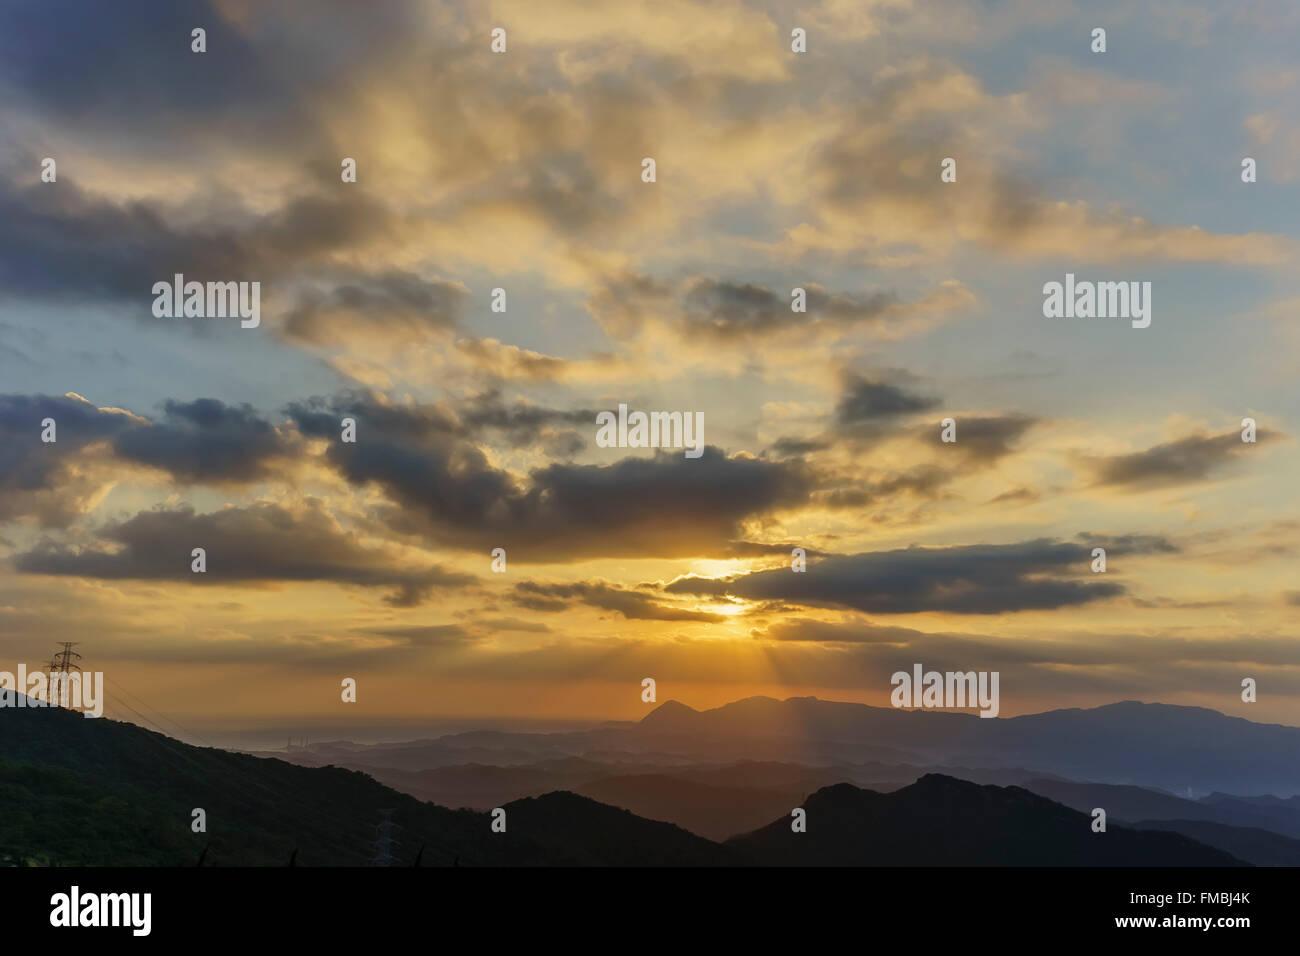 Sun rise at five finger mountain of Taipei, Taiwan - Stock Image